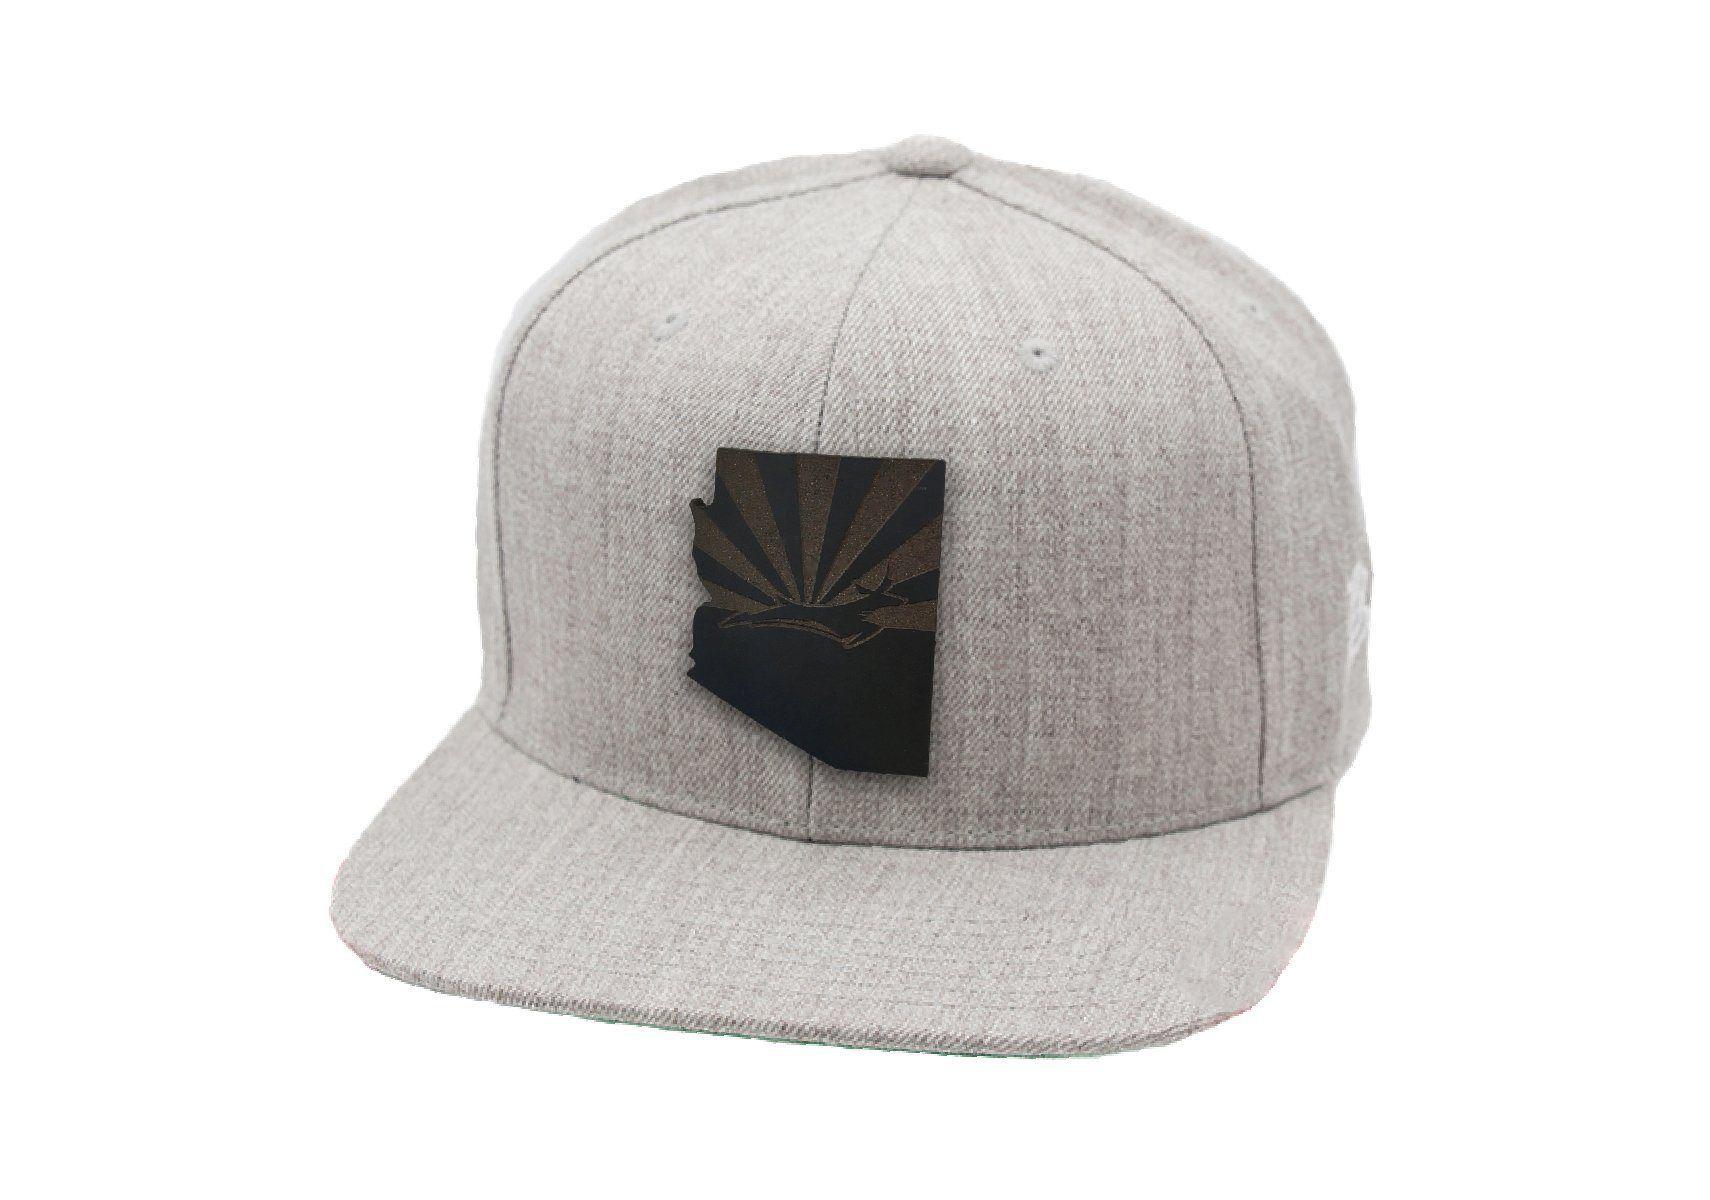 95df7978dfd Midnight GCU Lope   Products   Baseball hats, Snapback hats, Cheap ...